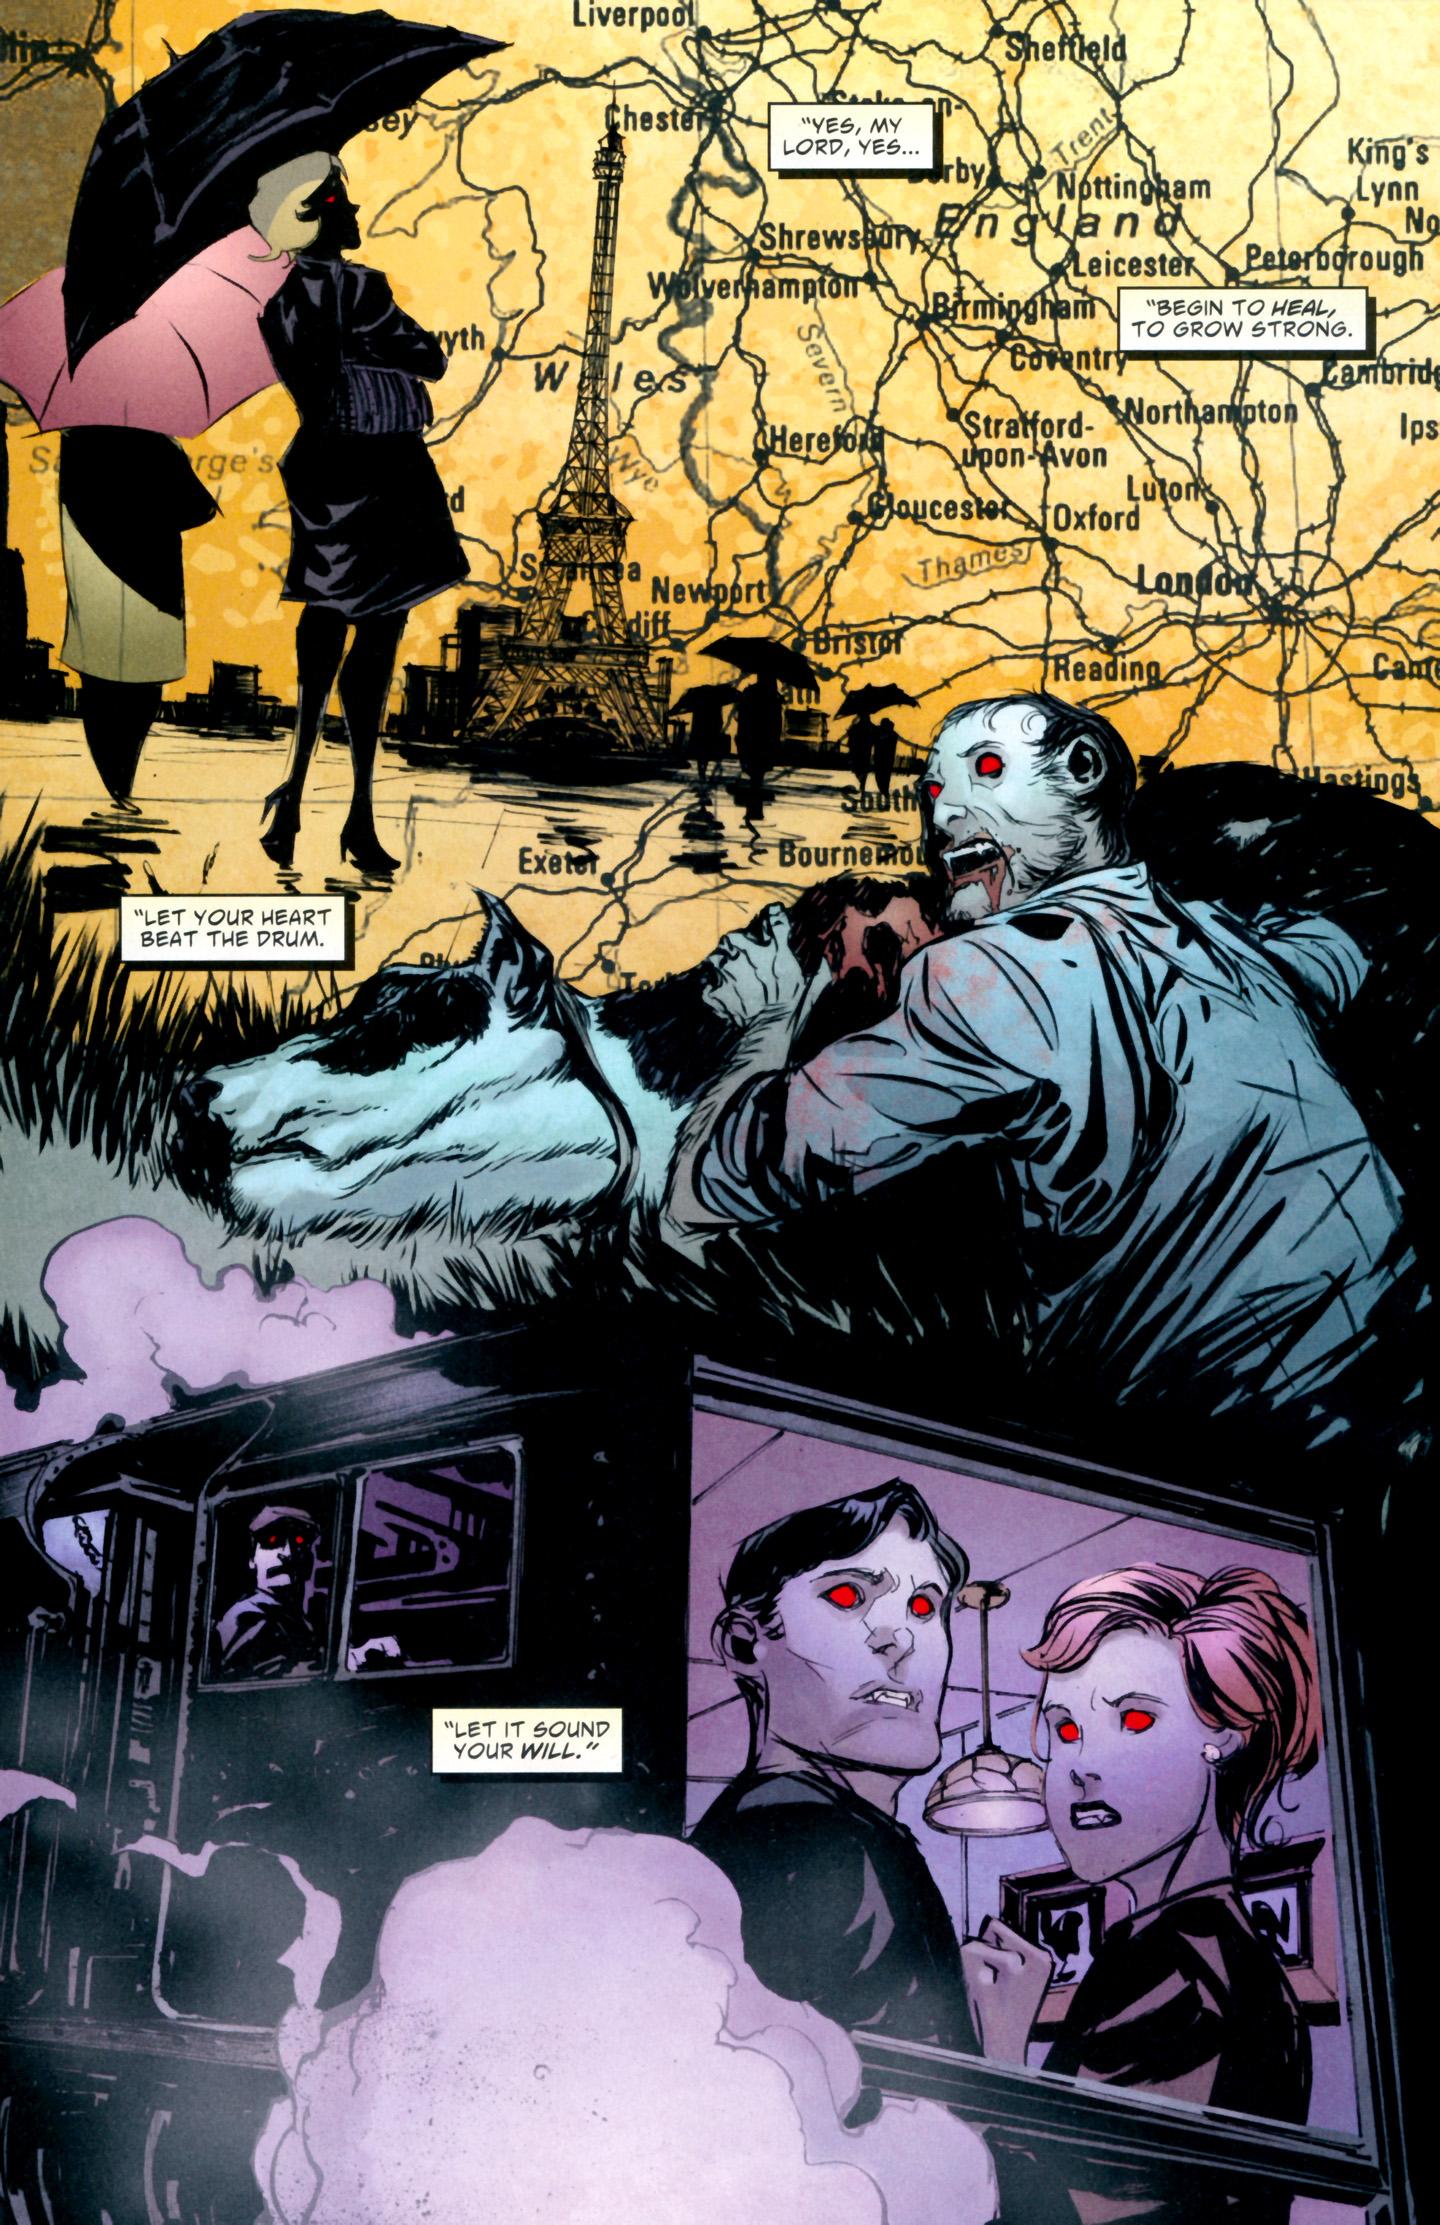 Read online American Vampire: Lord of Nightmares comic -  Issue #2 - 19